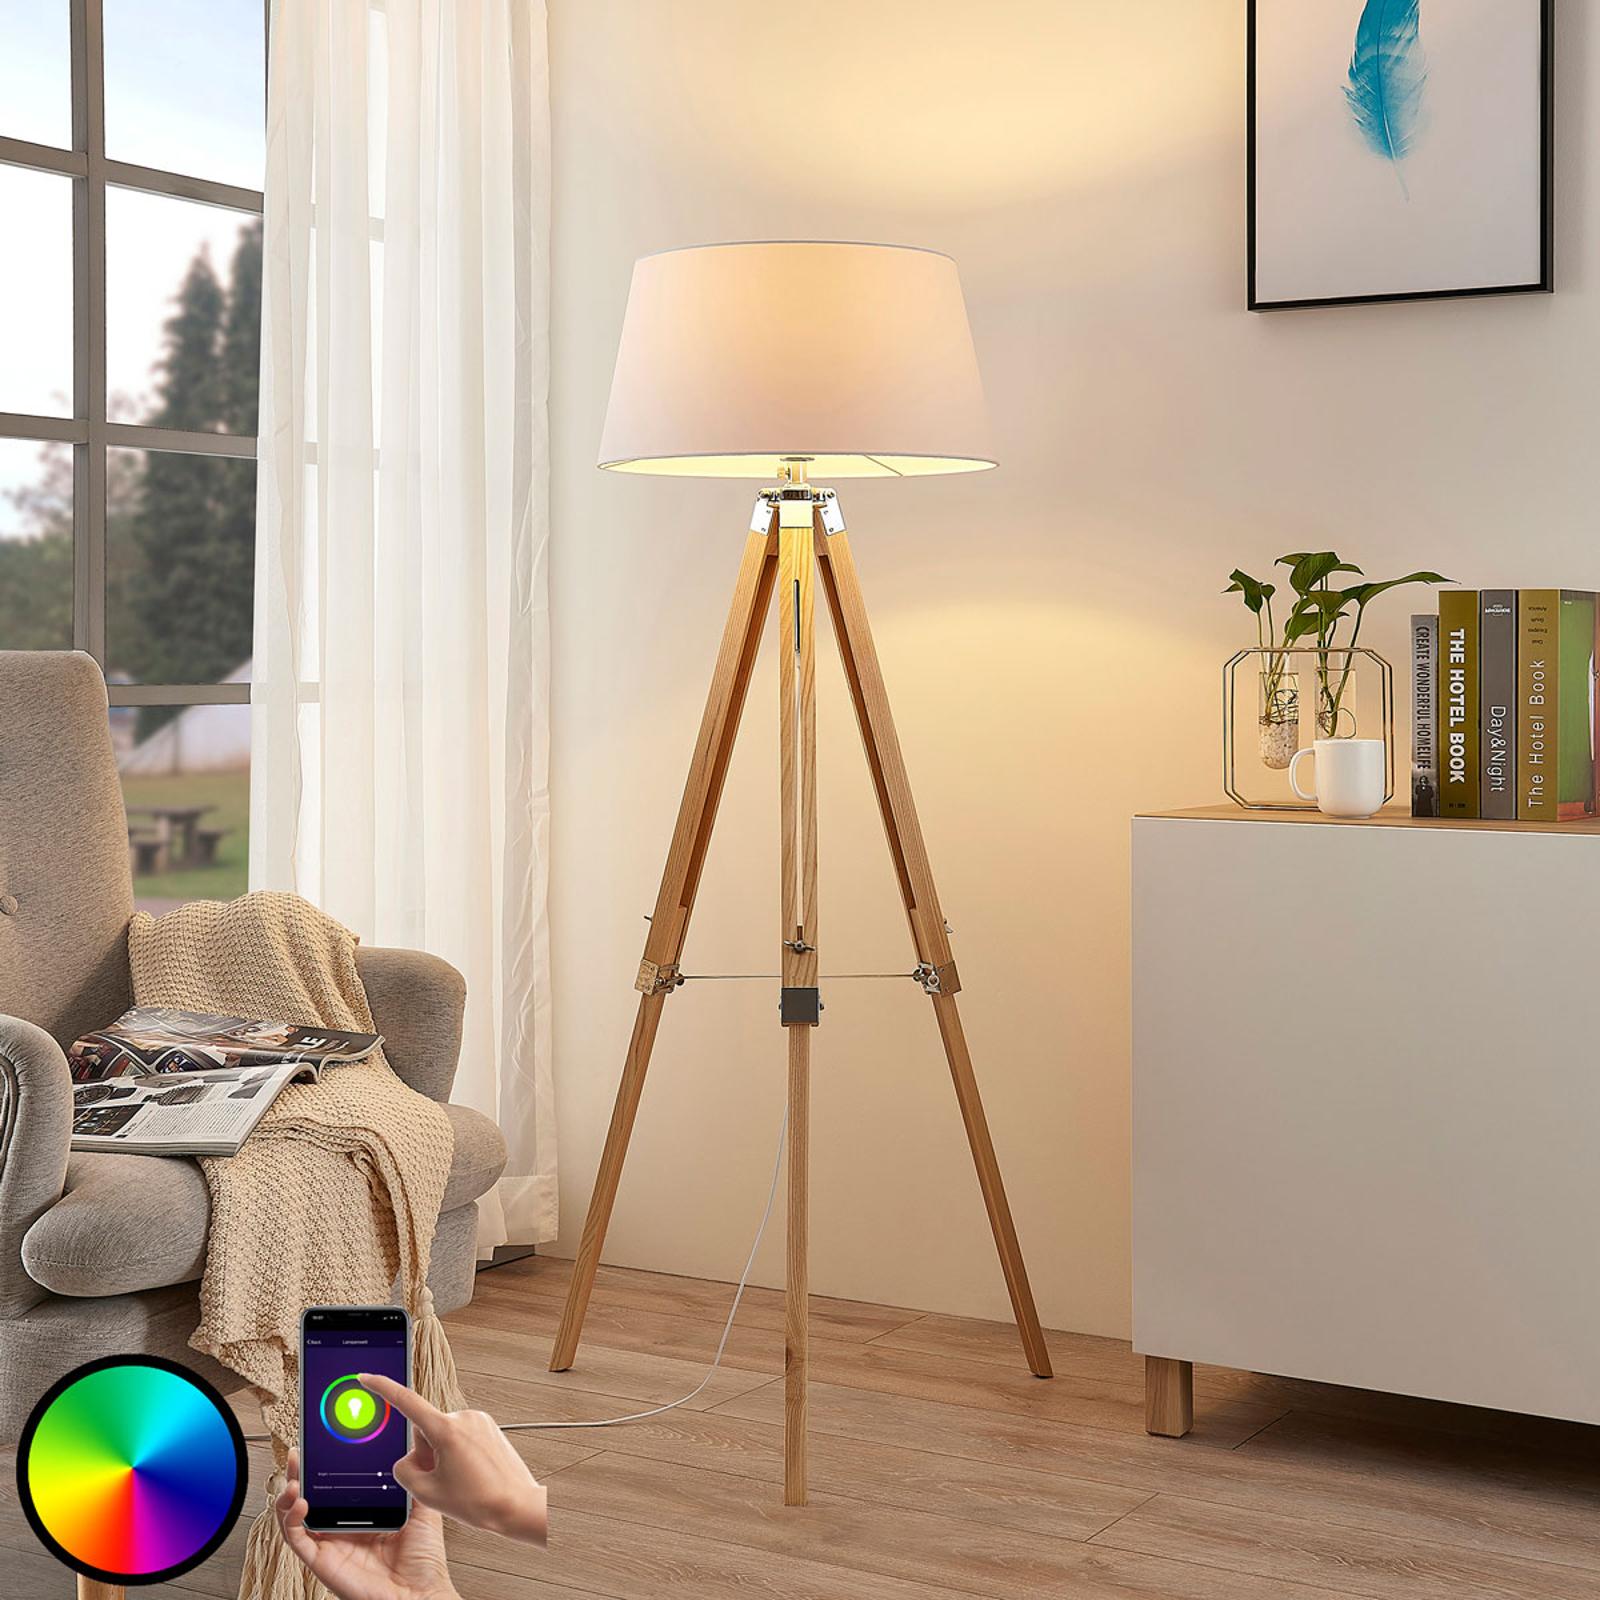 Lindby Smart lampa stojąca LED Alessa, app RGB